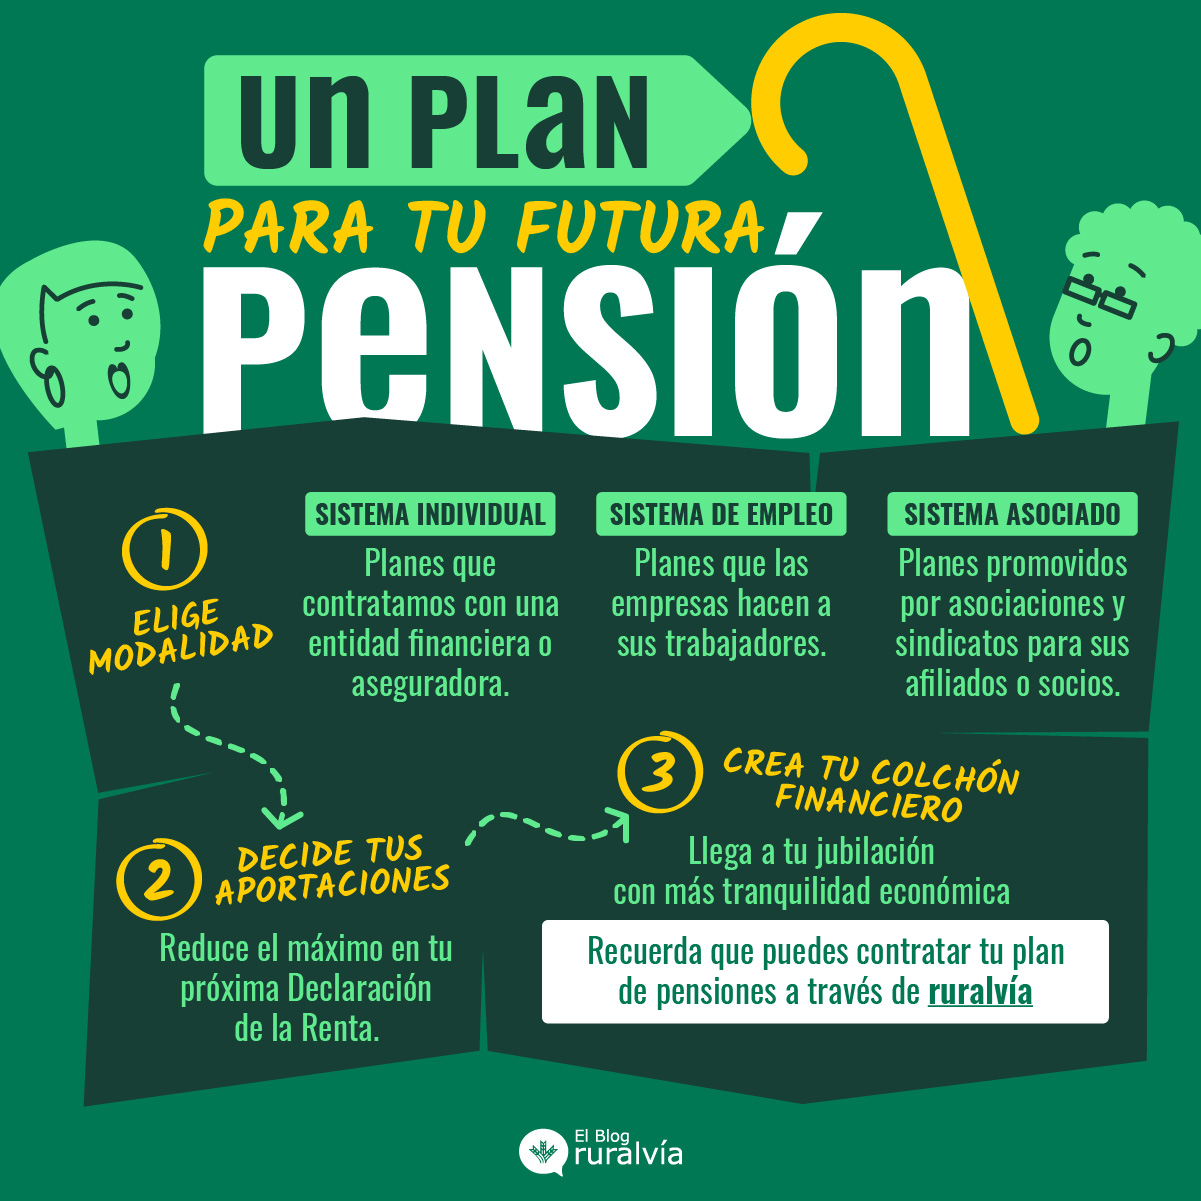 Un plan para tu futura pensión